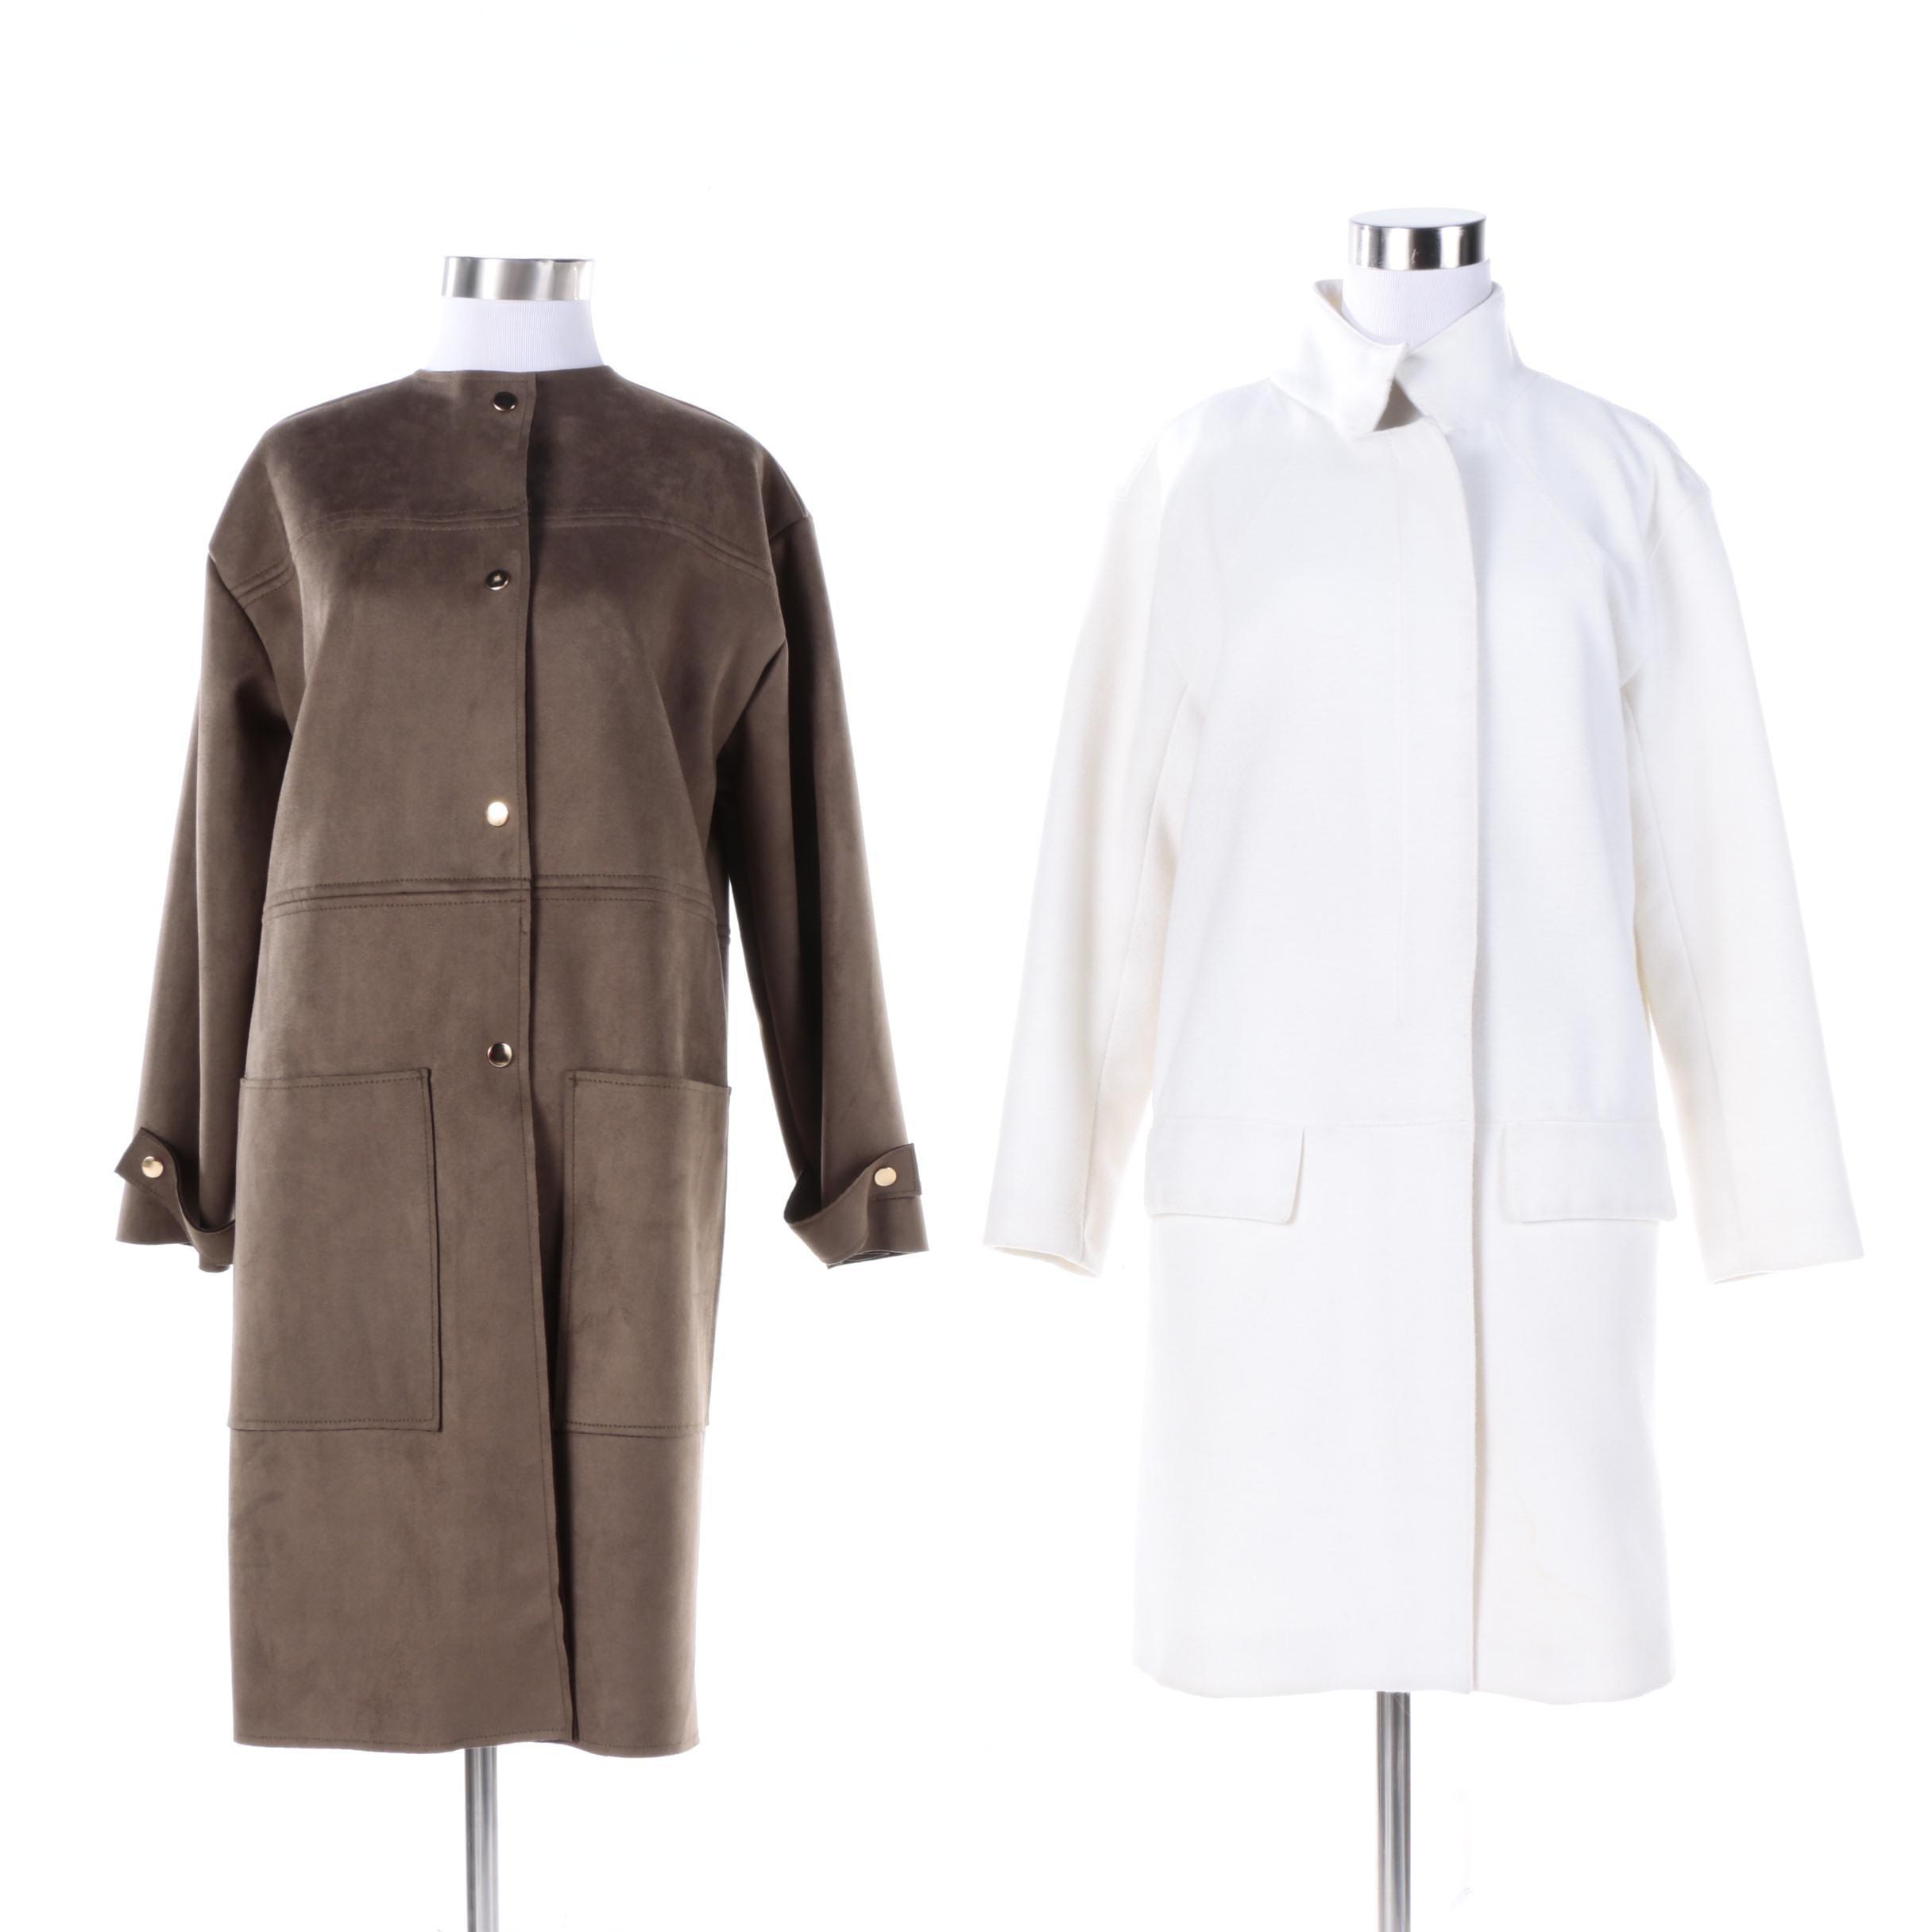 Women's Zara Collection and Zara Woman Coats